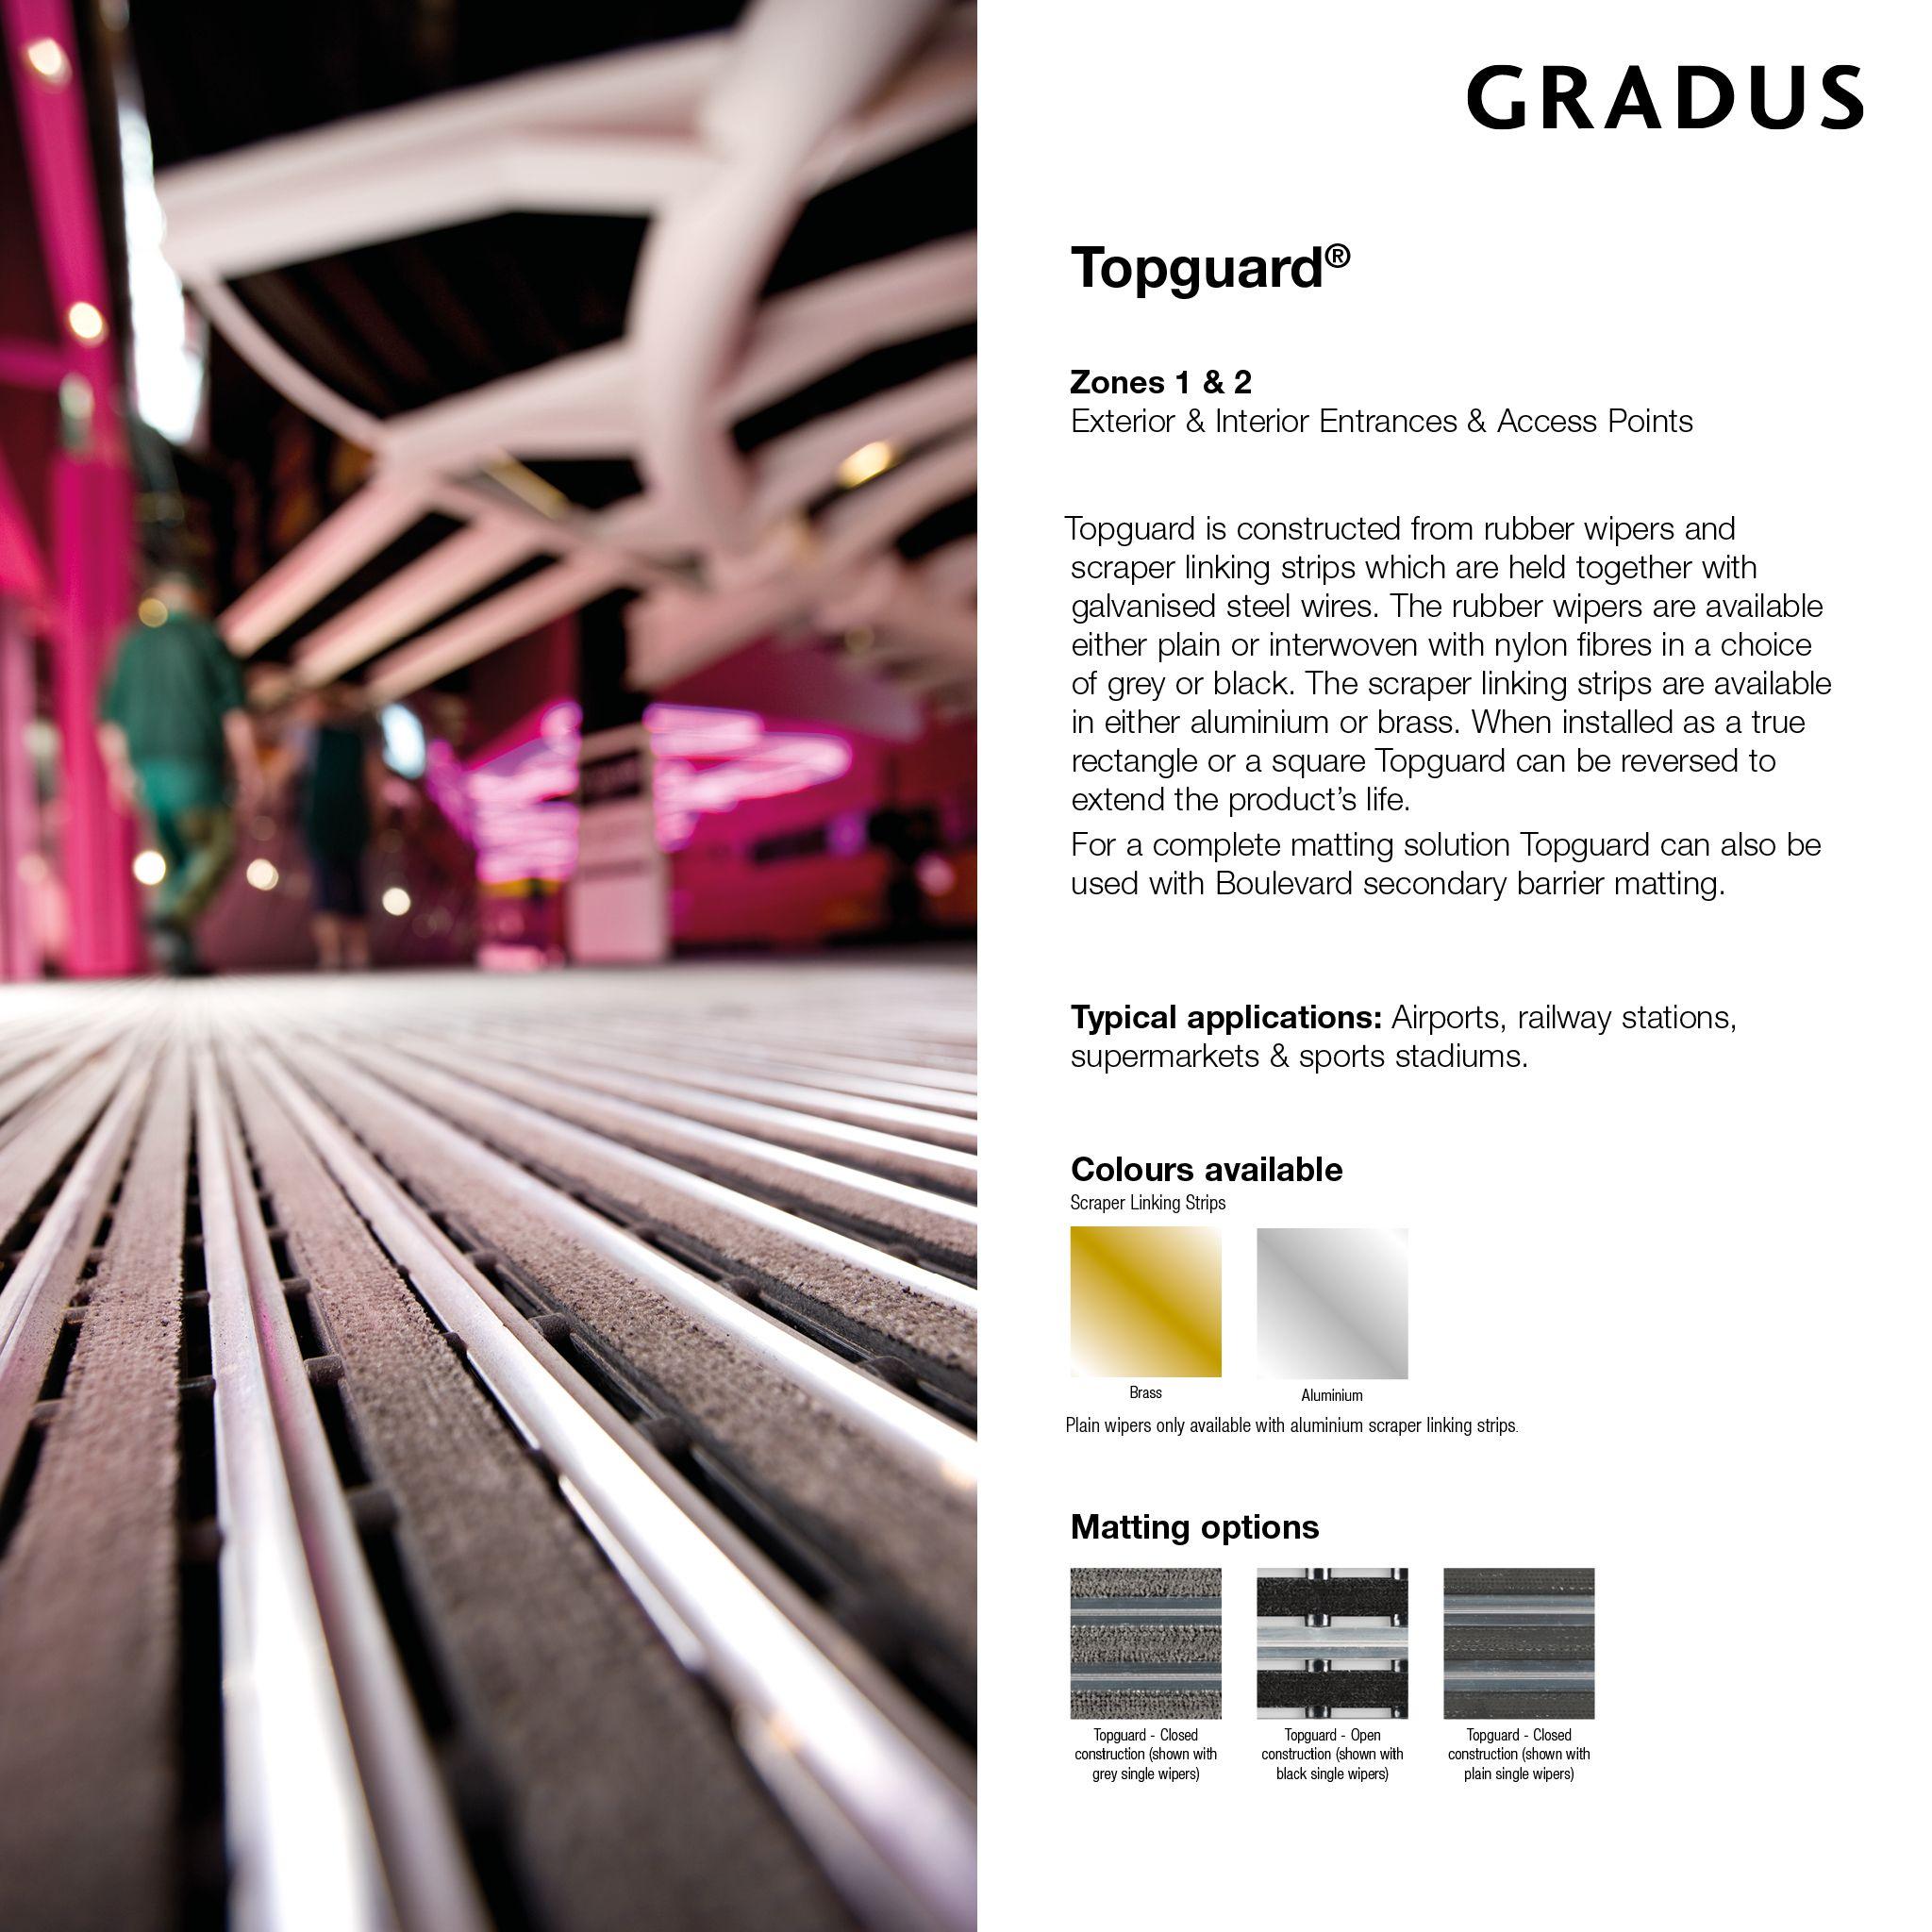 Pin on Gradus Barrier Matting System